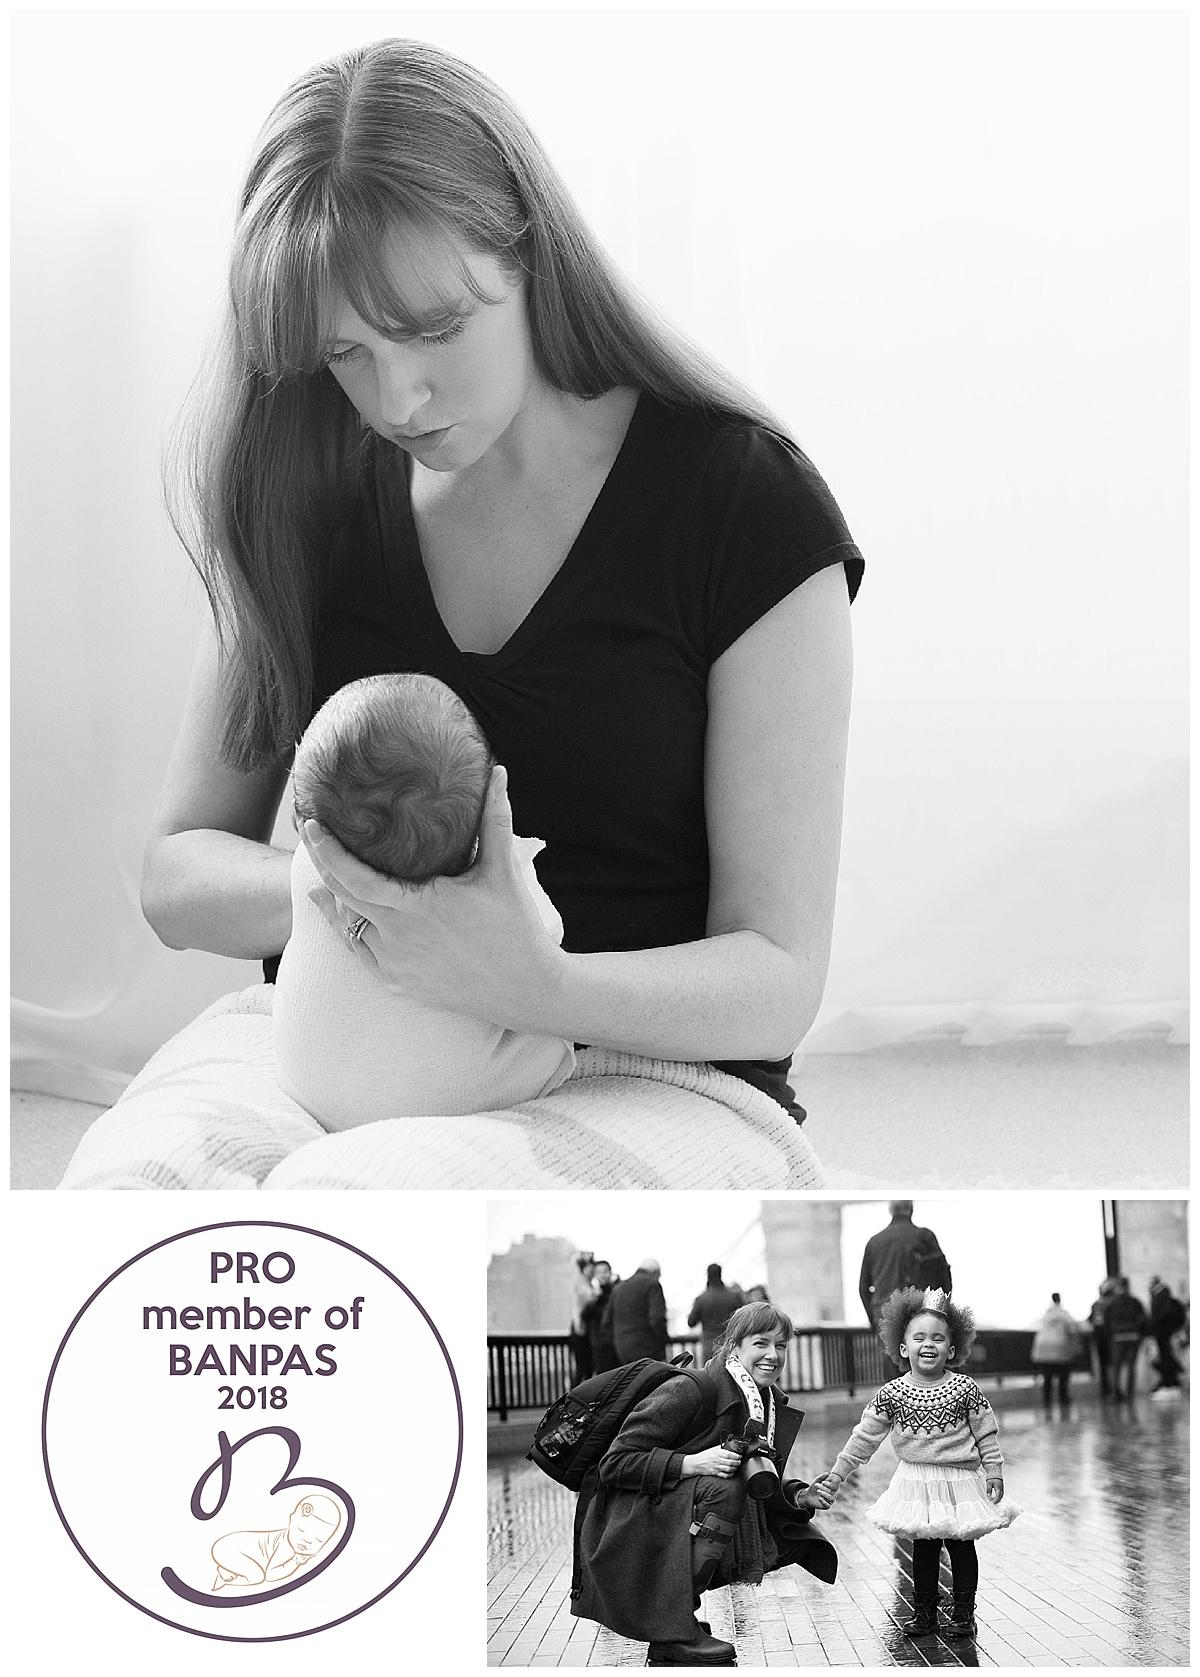 newborn photographer edinburgh, professional photos of Edinburgh newborn photographer Rachael lynch of Beautiful Bairns Photography, Edinburgh